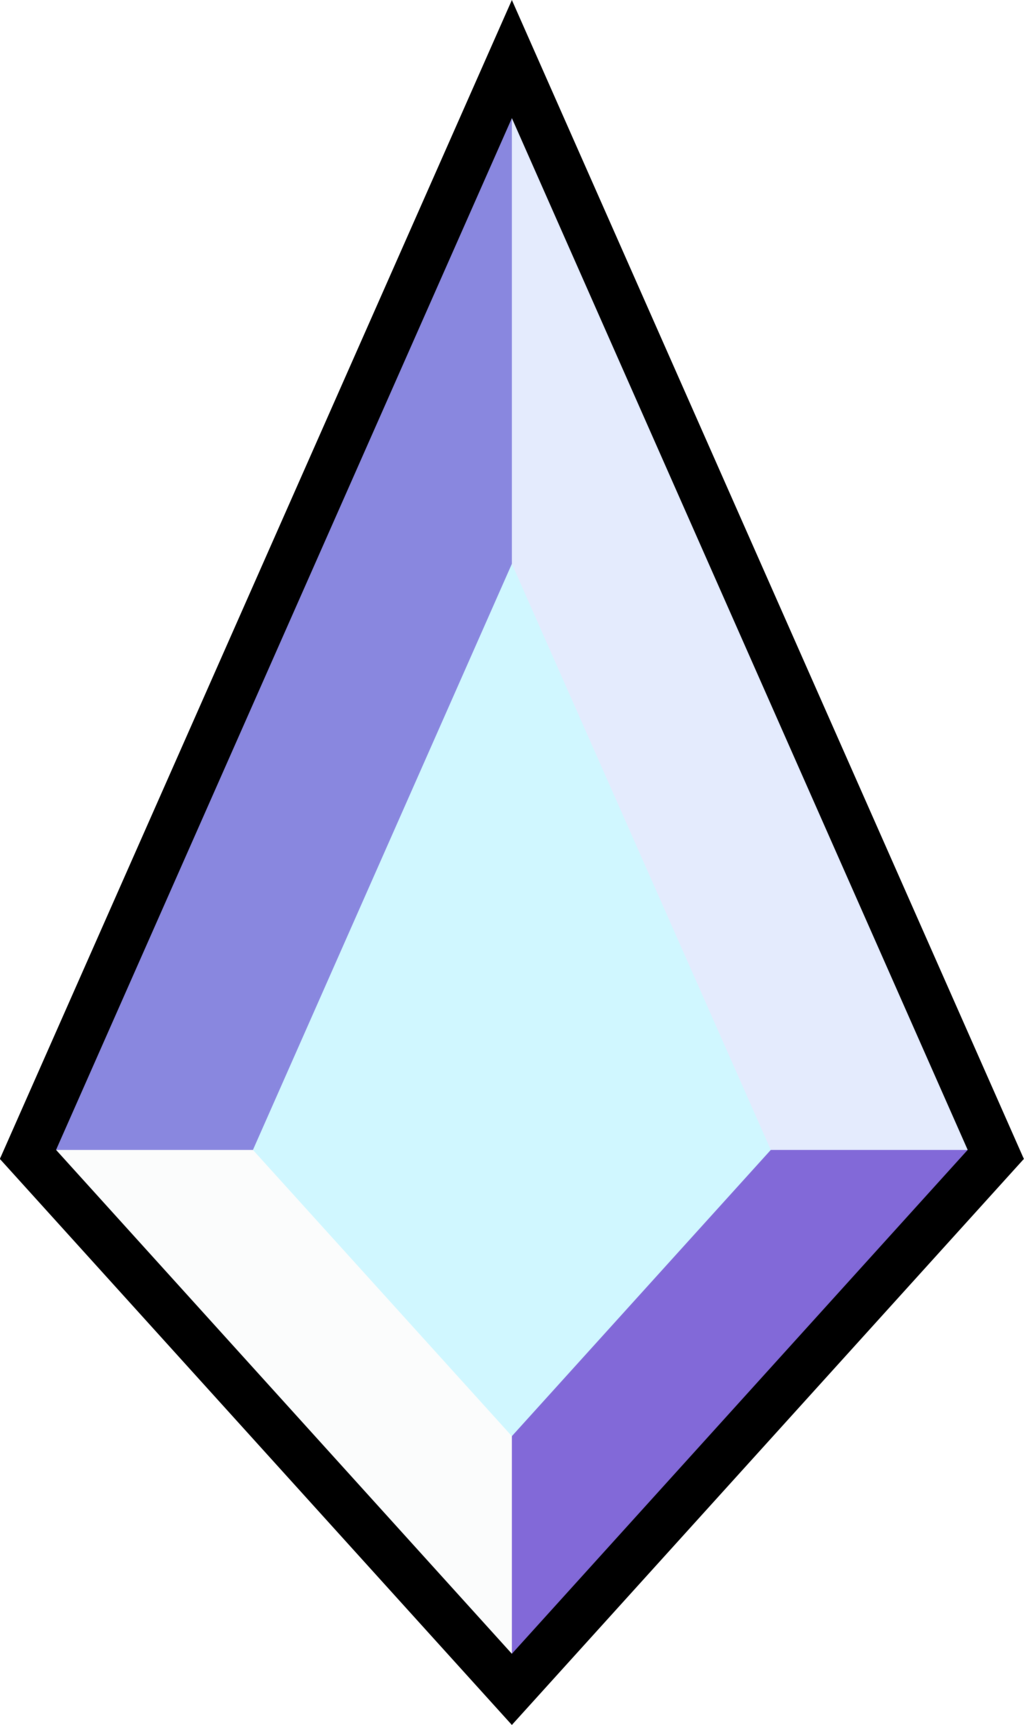 diamond gemstones in. Gem clipart neon